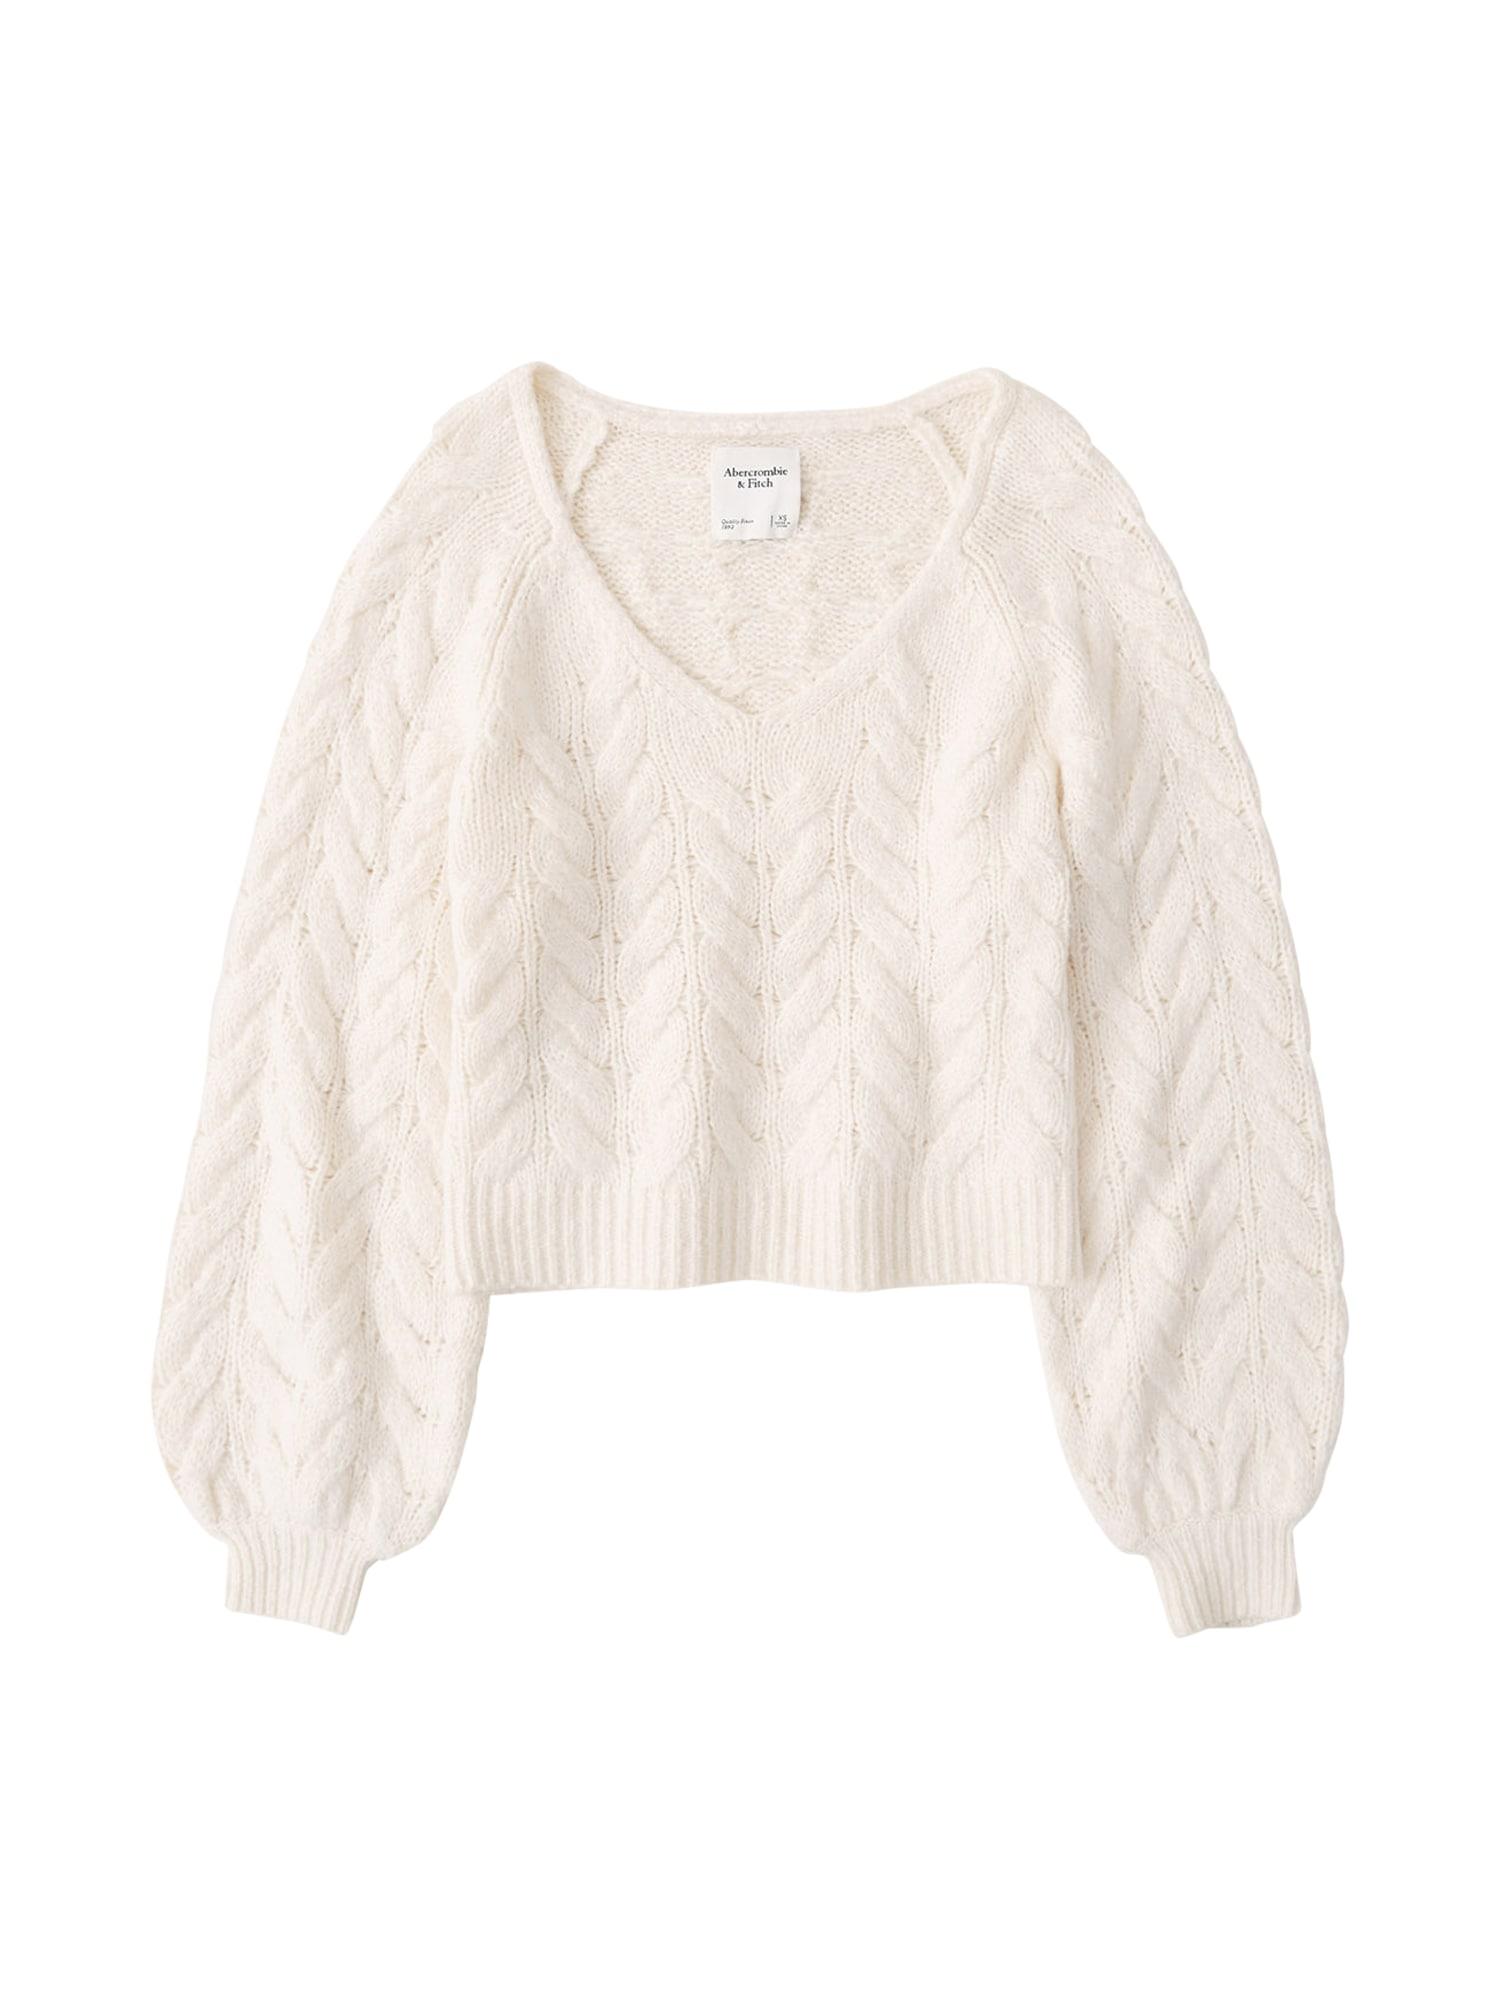 Abercrombie & Fitch Megztinis kremo